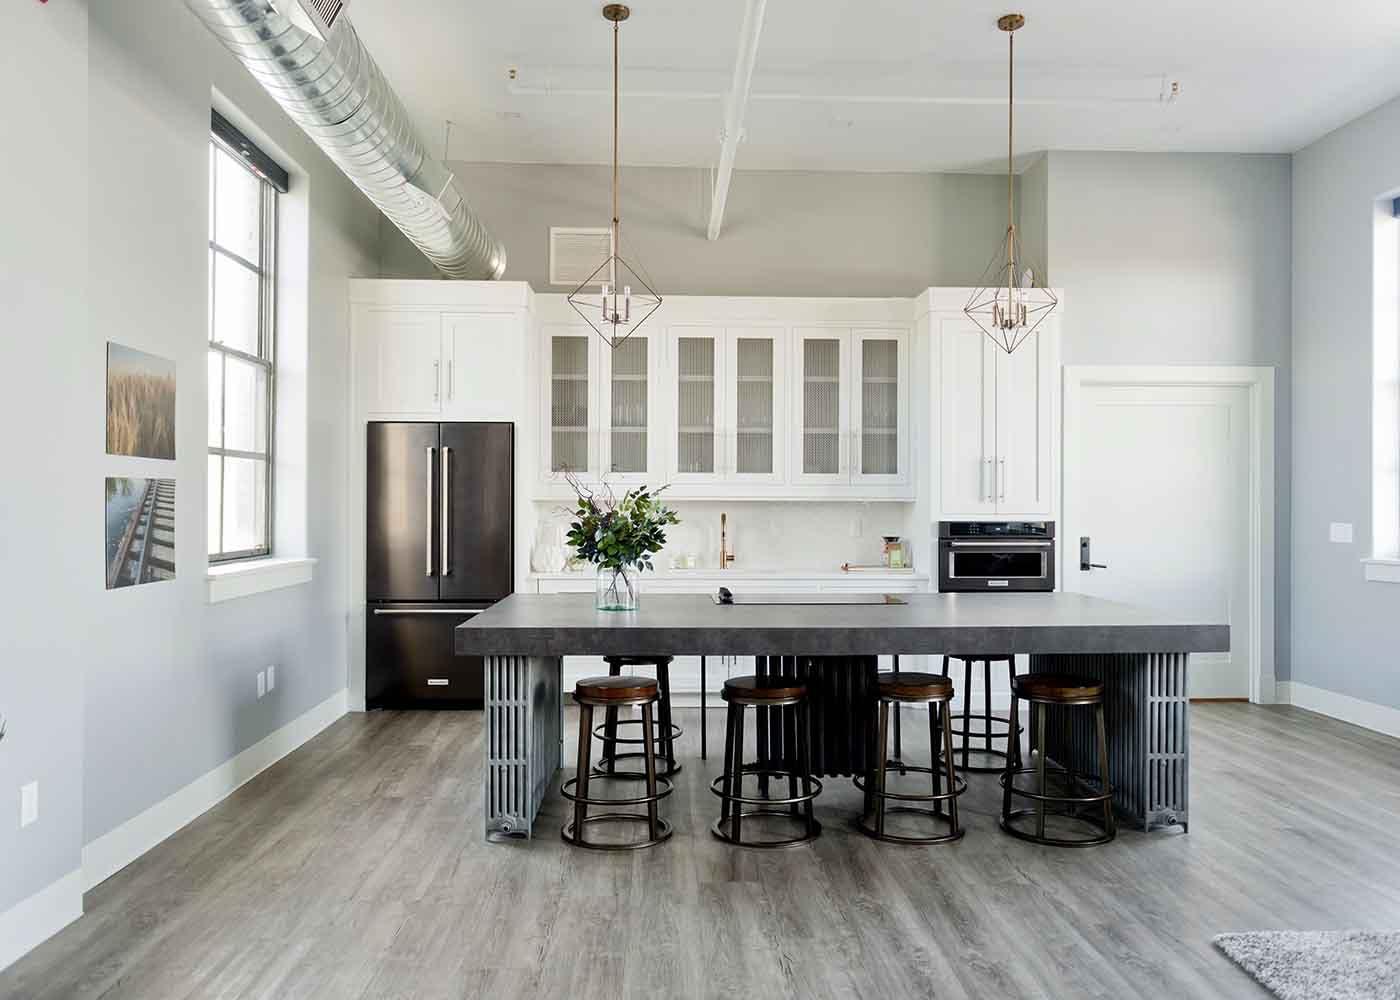 Interior kitchen at a luxury condo